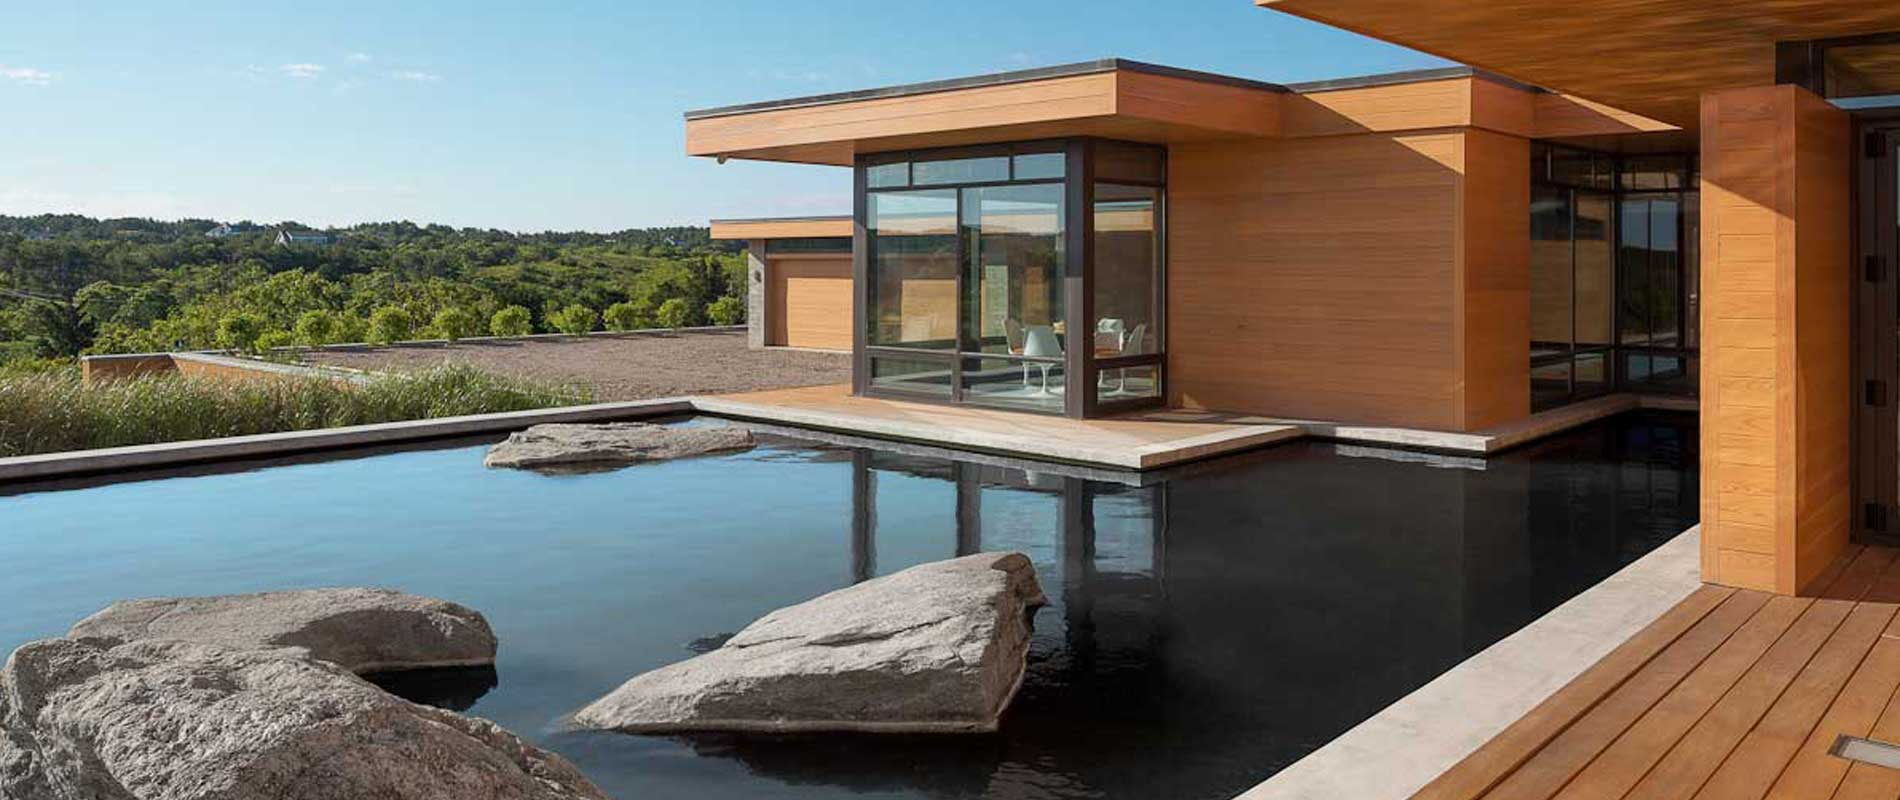 mod-ocean-rock-pool